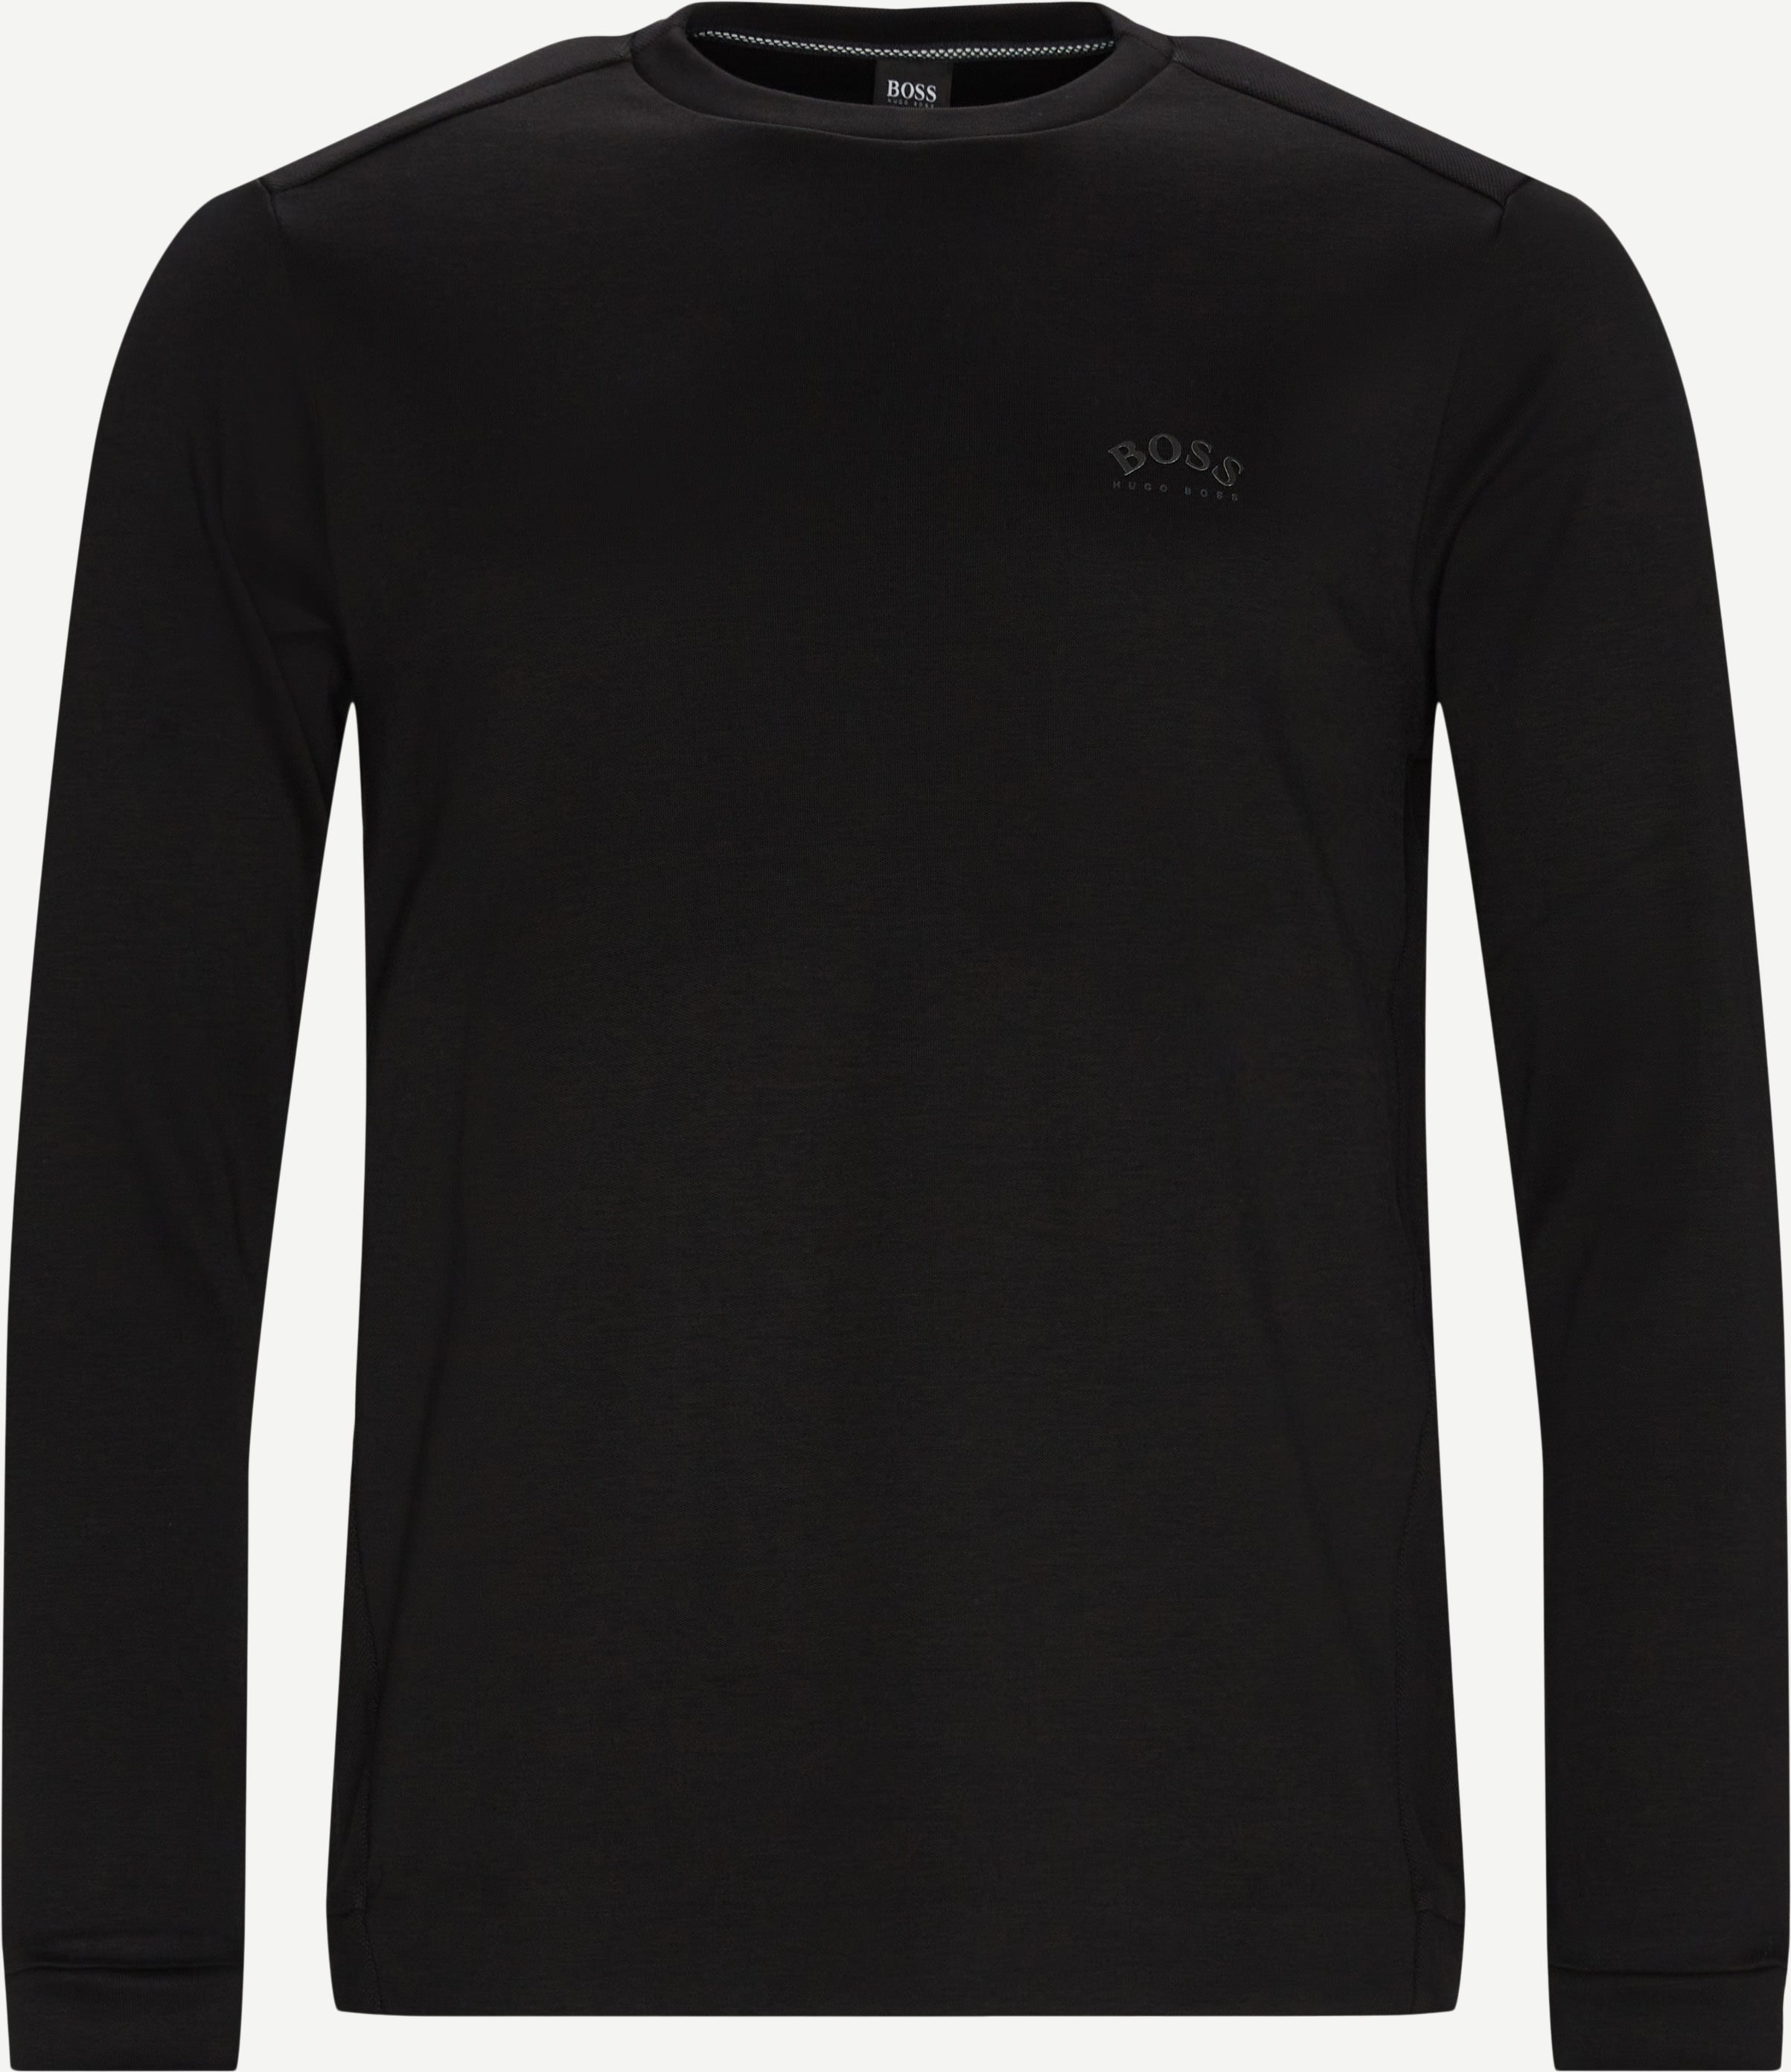 Salbo Sweatshirt - Sweatshirts - Regular fit - Sort